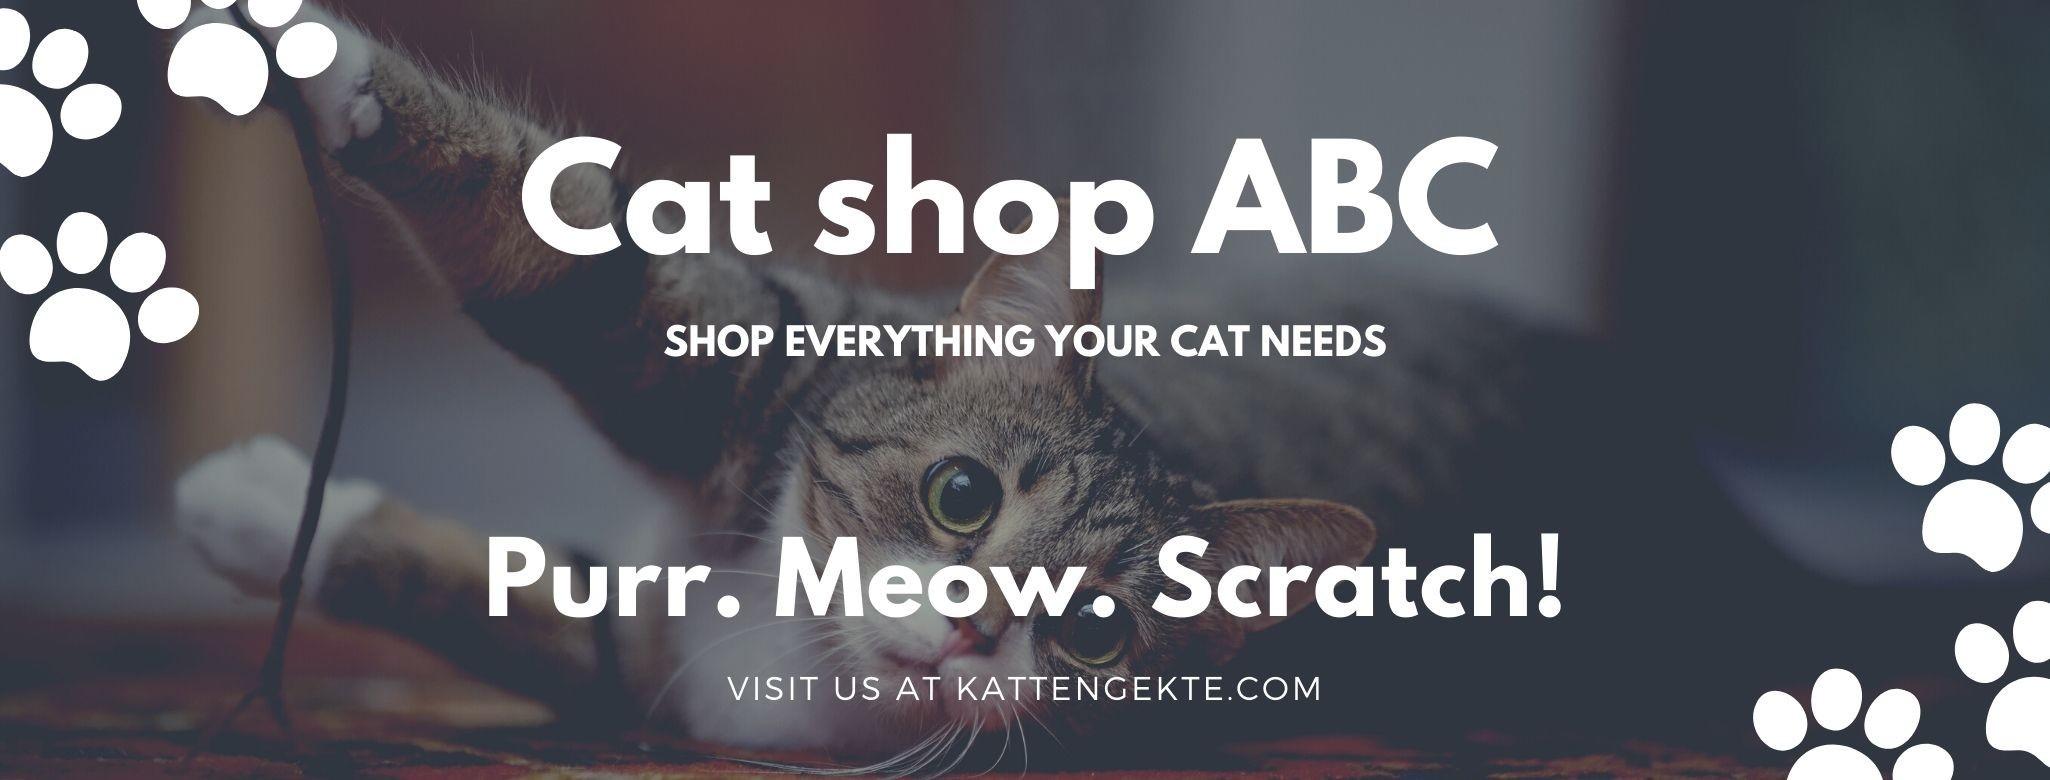 Cat shop ABC on Facebook